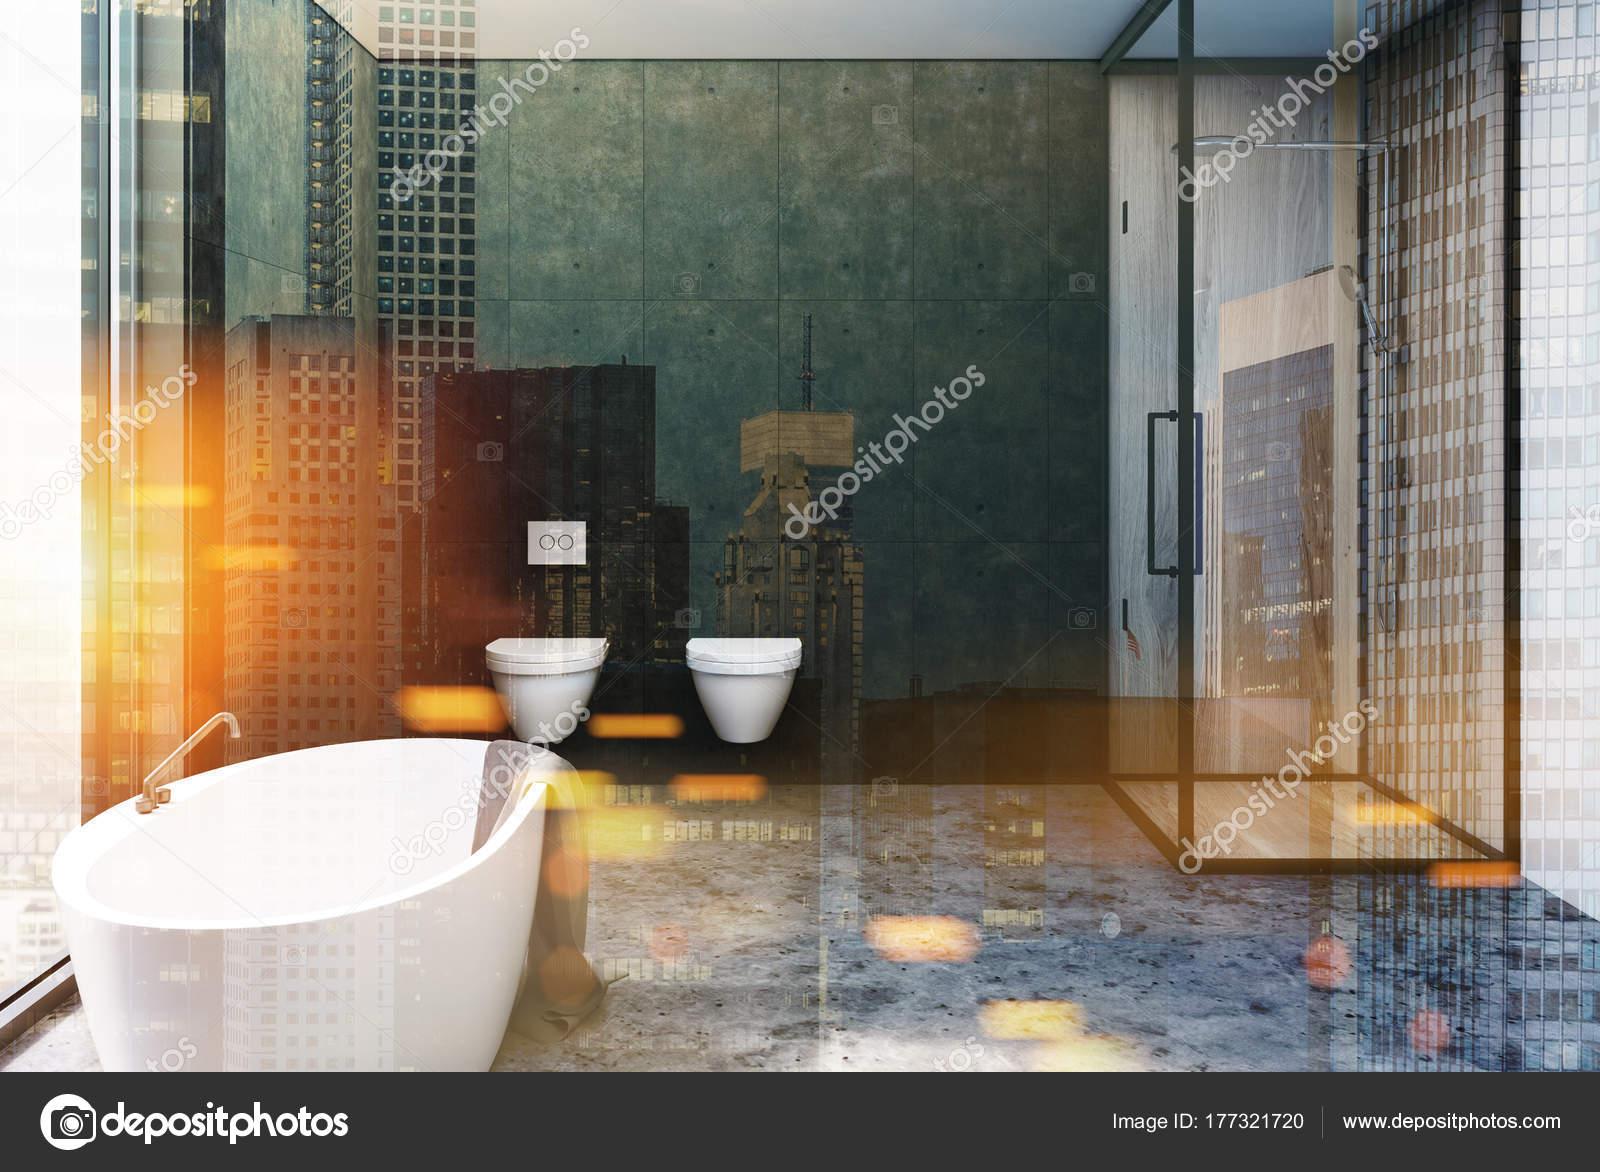 Dunkel Grau Badezimmer Interieur Toiletten Getonten Stockfoto